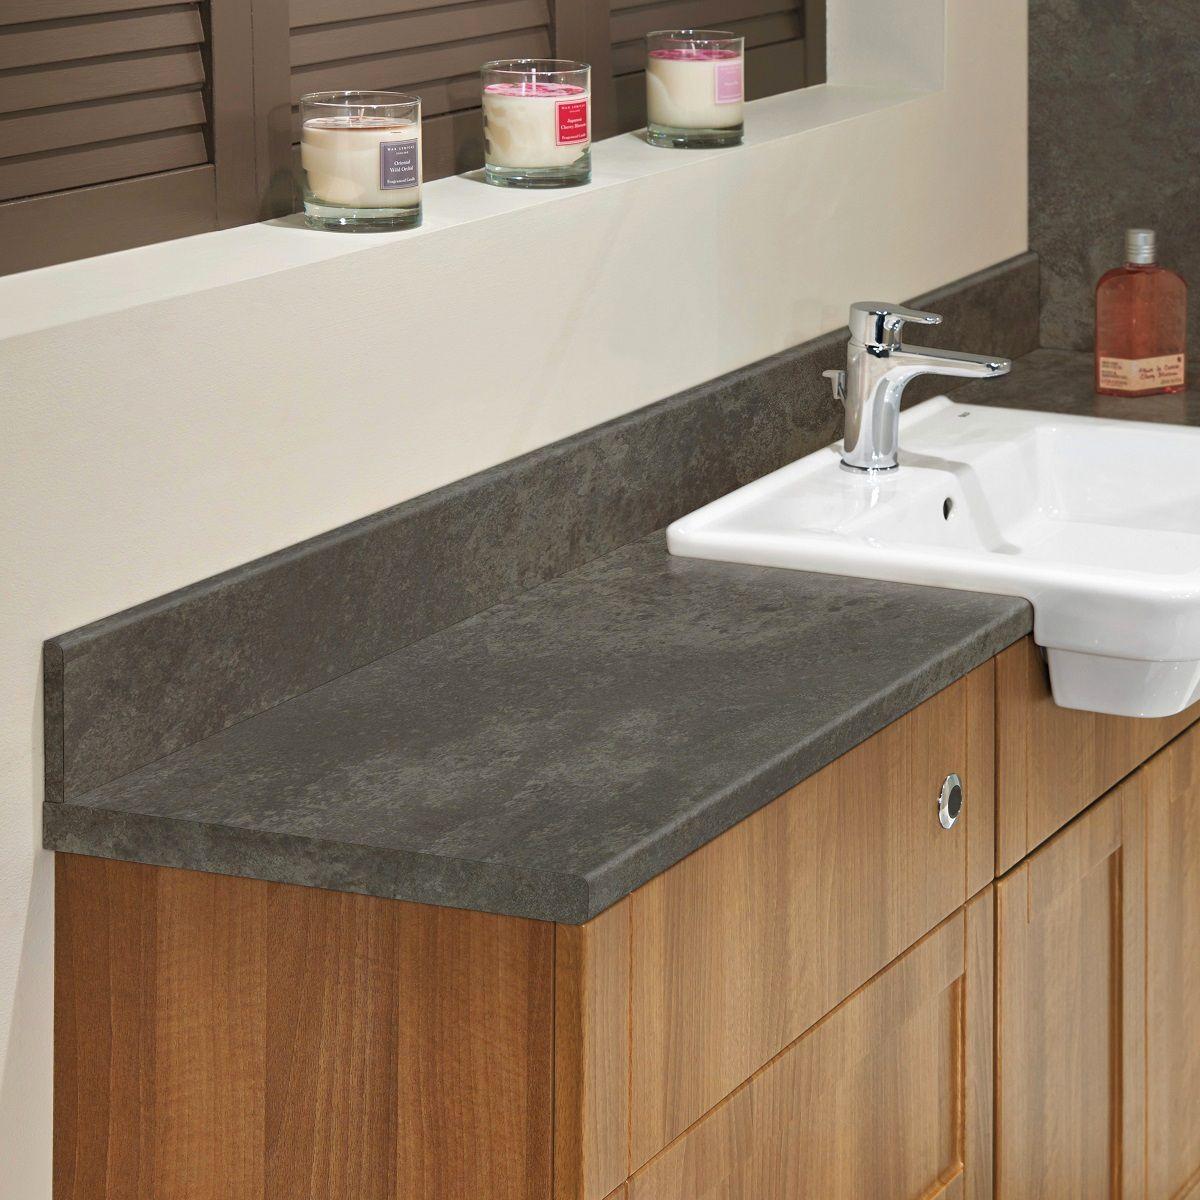 Bushboard Nuance 360mm Slim Laminate Worktop Uk Bathrooms